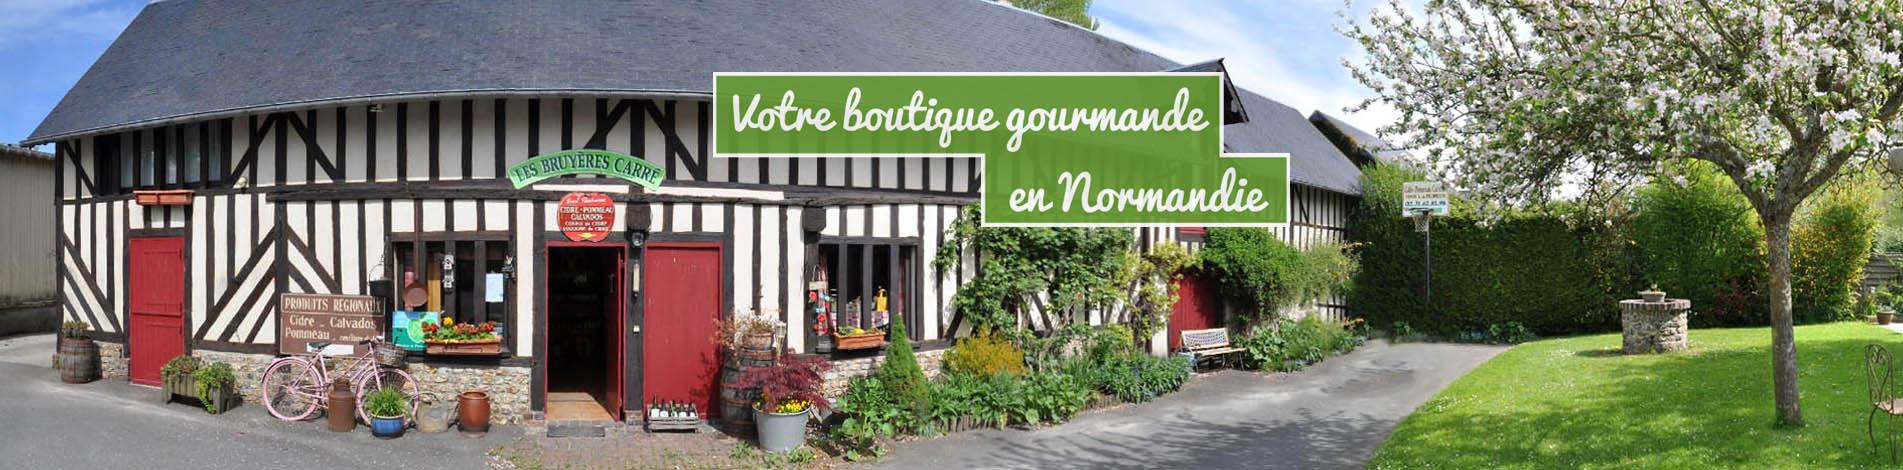 boutique normande cidre calvados